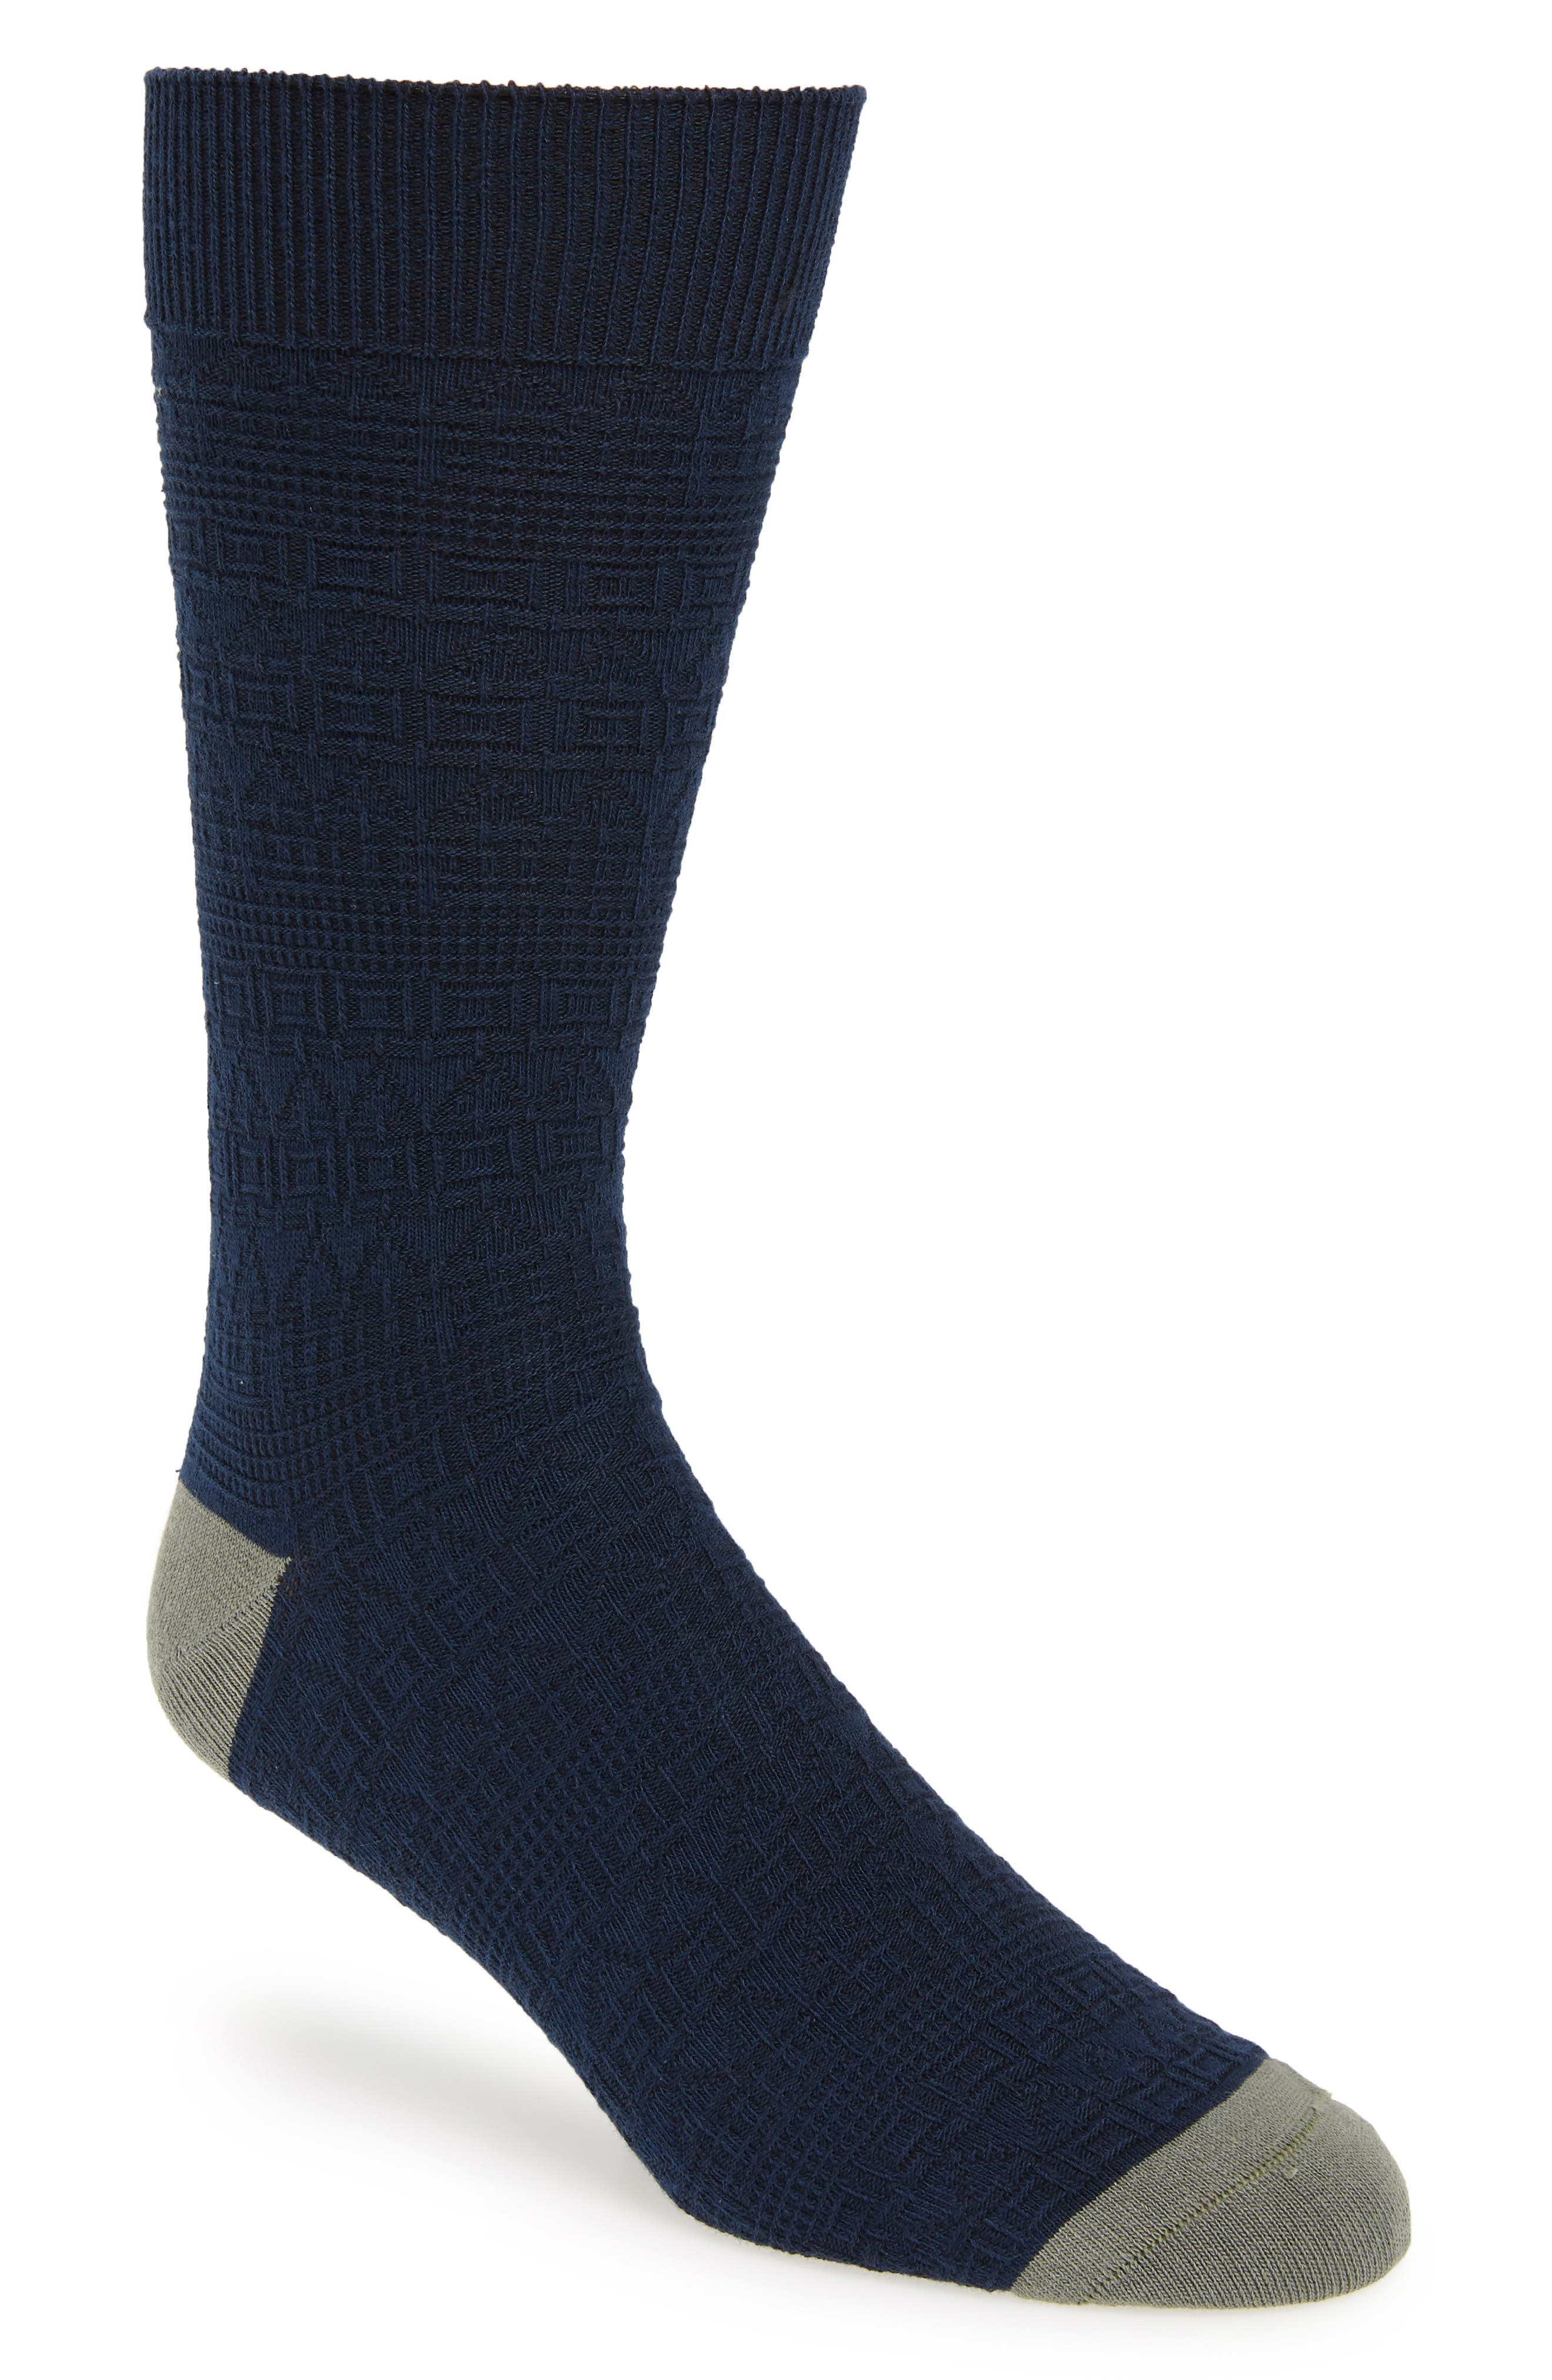 TED BAKER LONDON, Textured Socks, Main thumbnail 1, color, NAVY